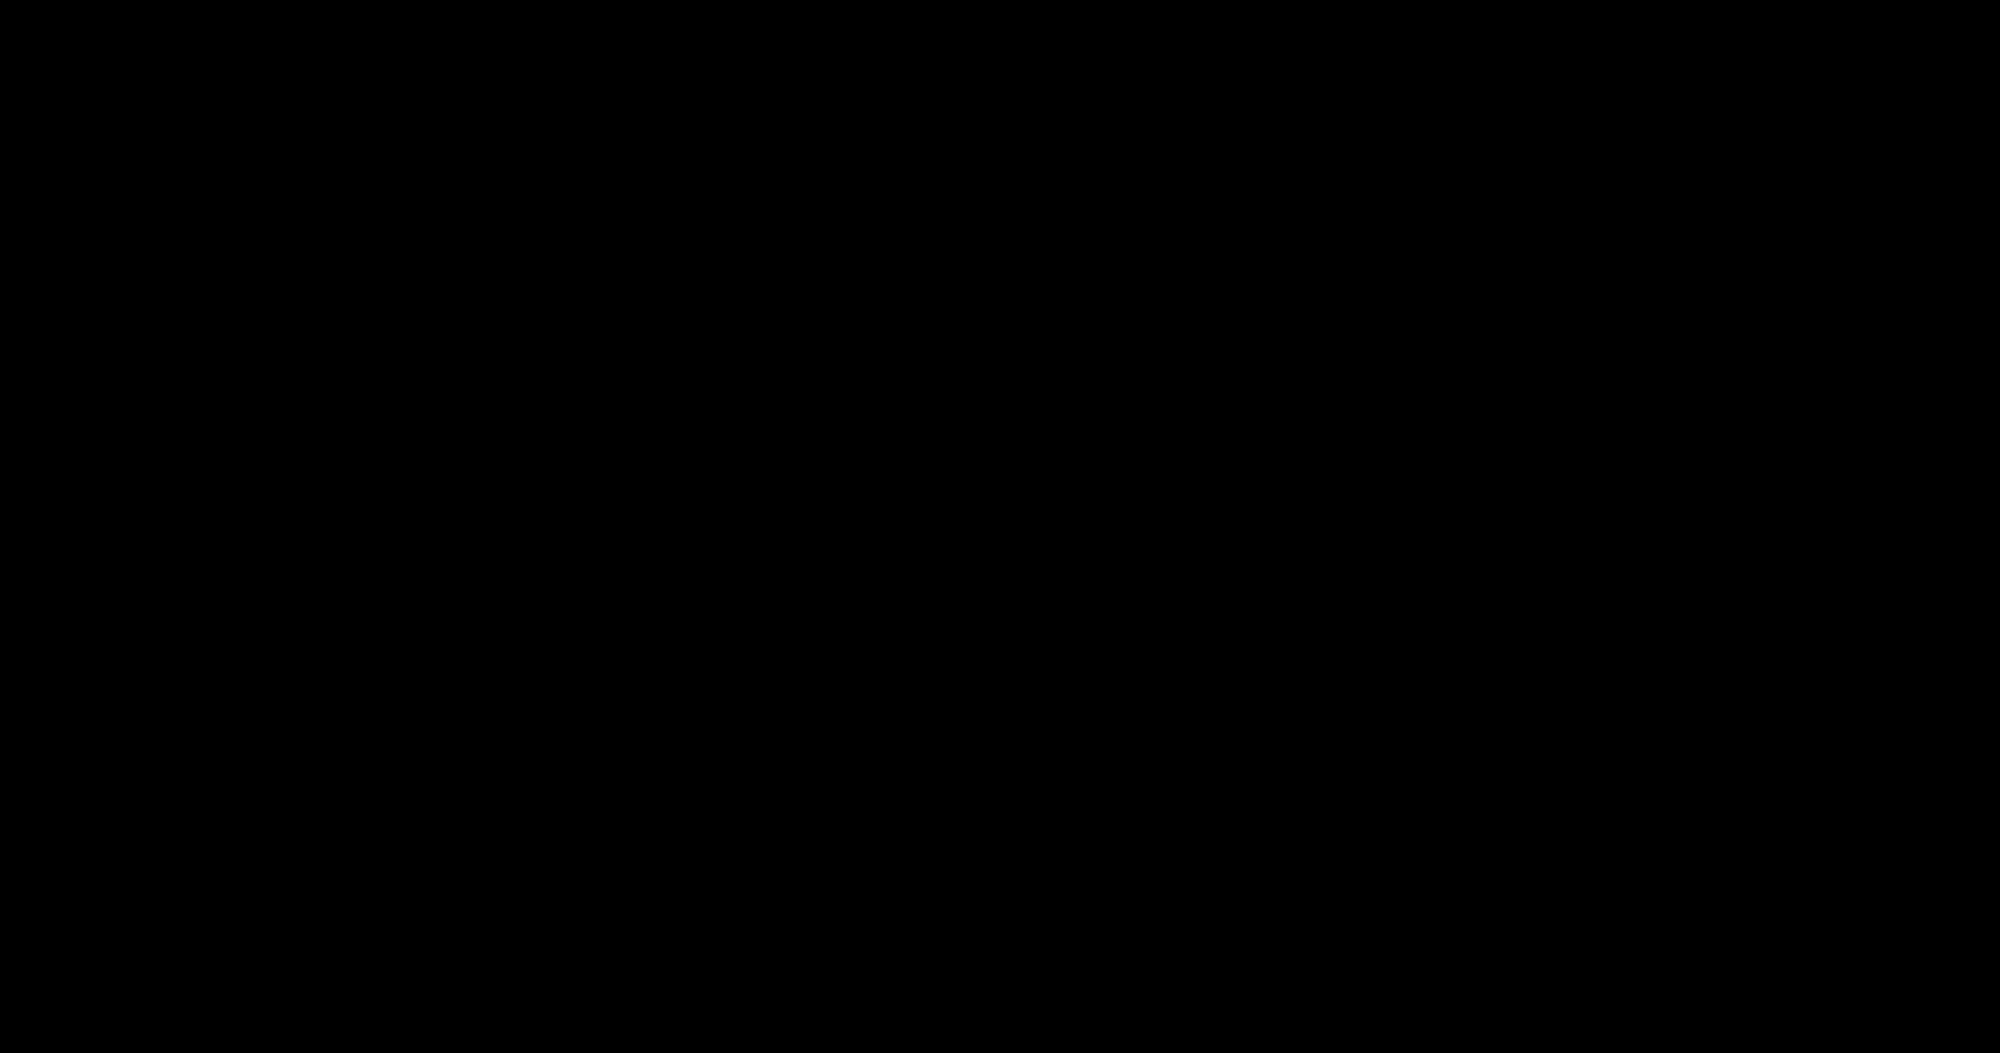 jpg freeuse stock Usa svg. File pfadsvgtutorial wikimedia commons